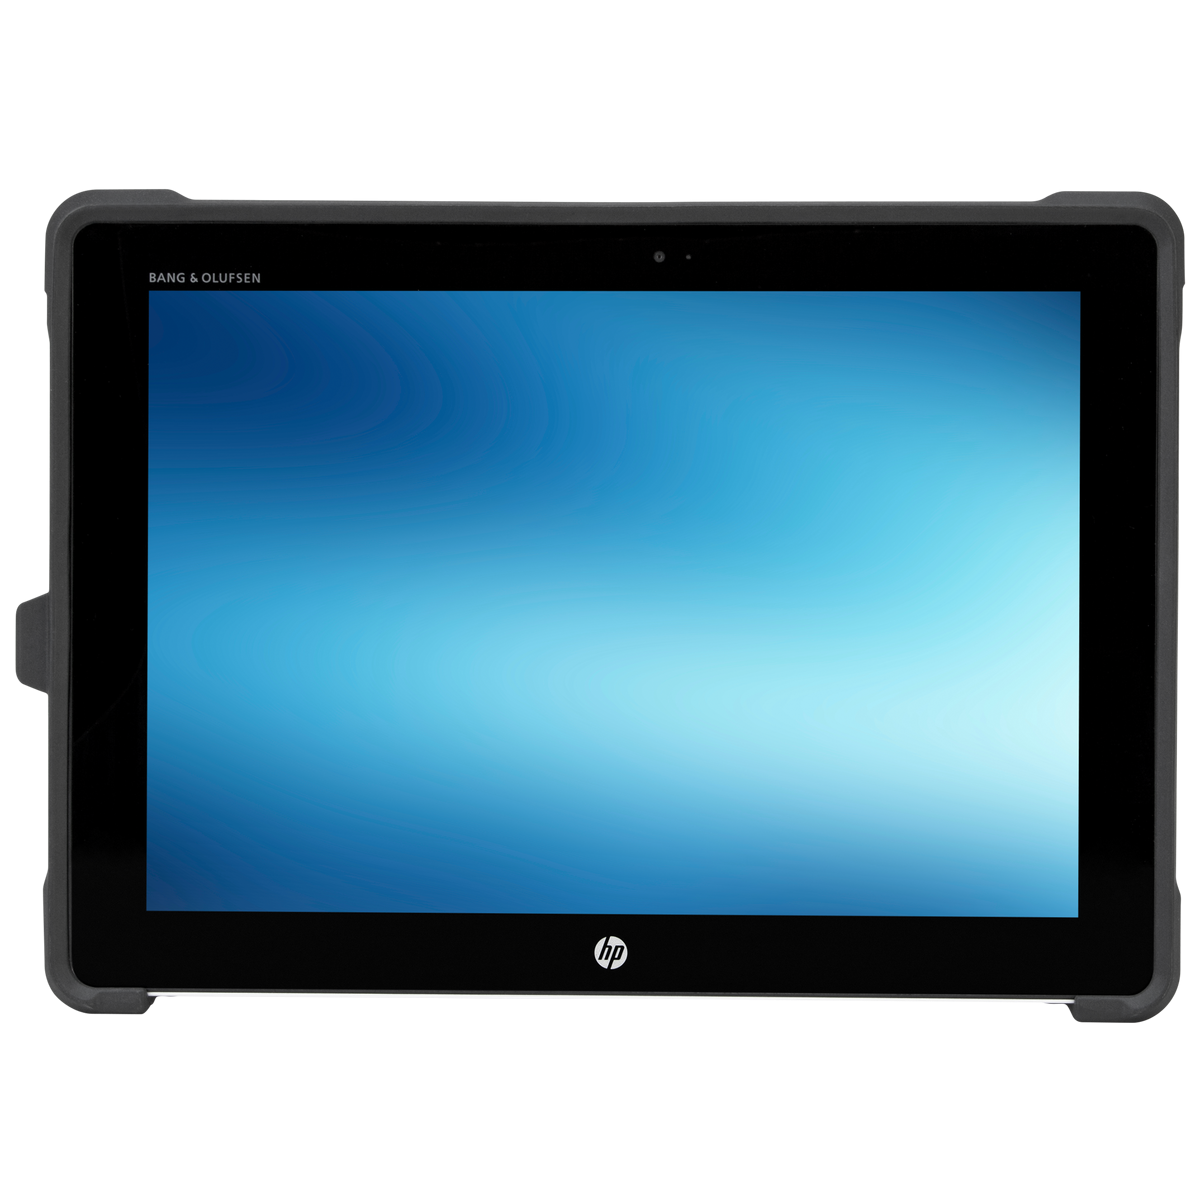 Commercial Grade Tablet Case For Hp Elite X2 1012